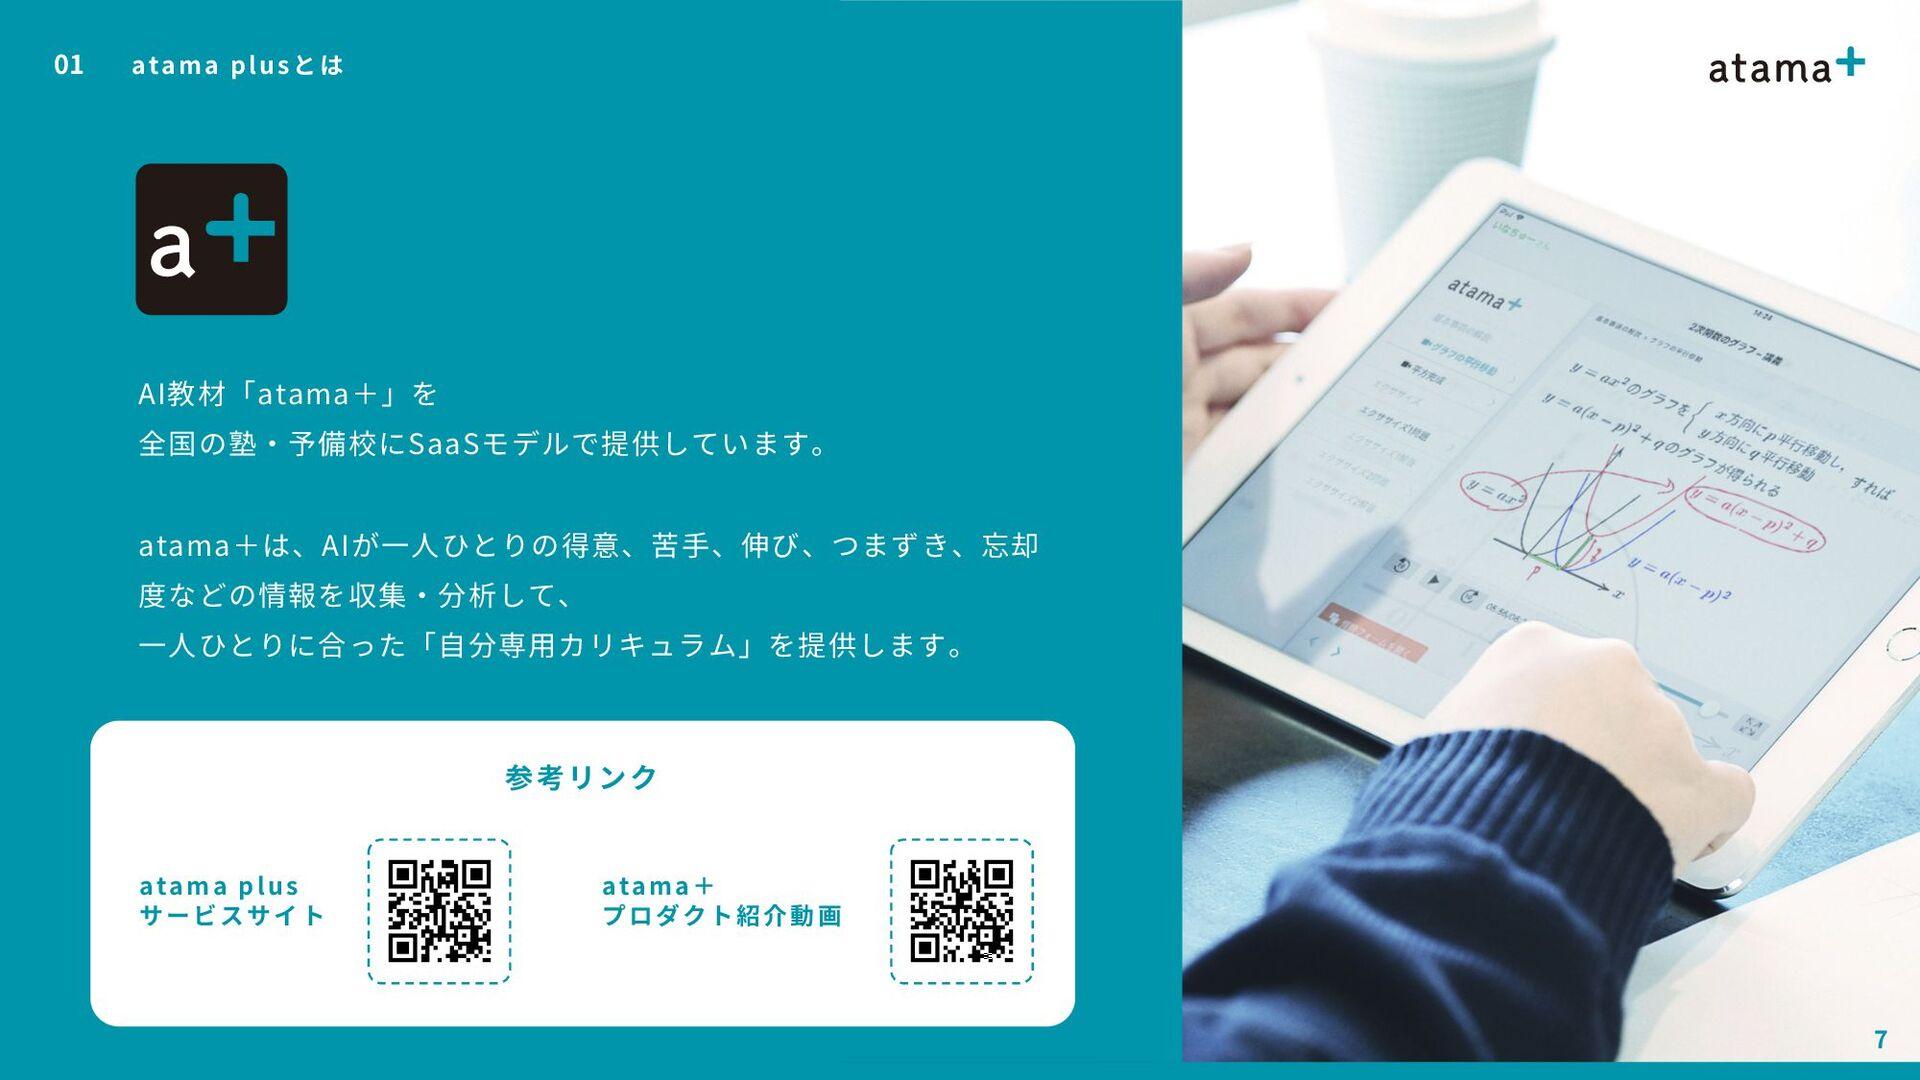 01 atama plusとは 7 タブレット教材アプリ「atama+」を 全国の塾・予備校に...